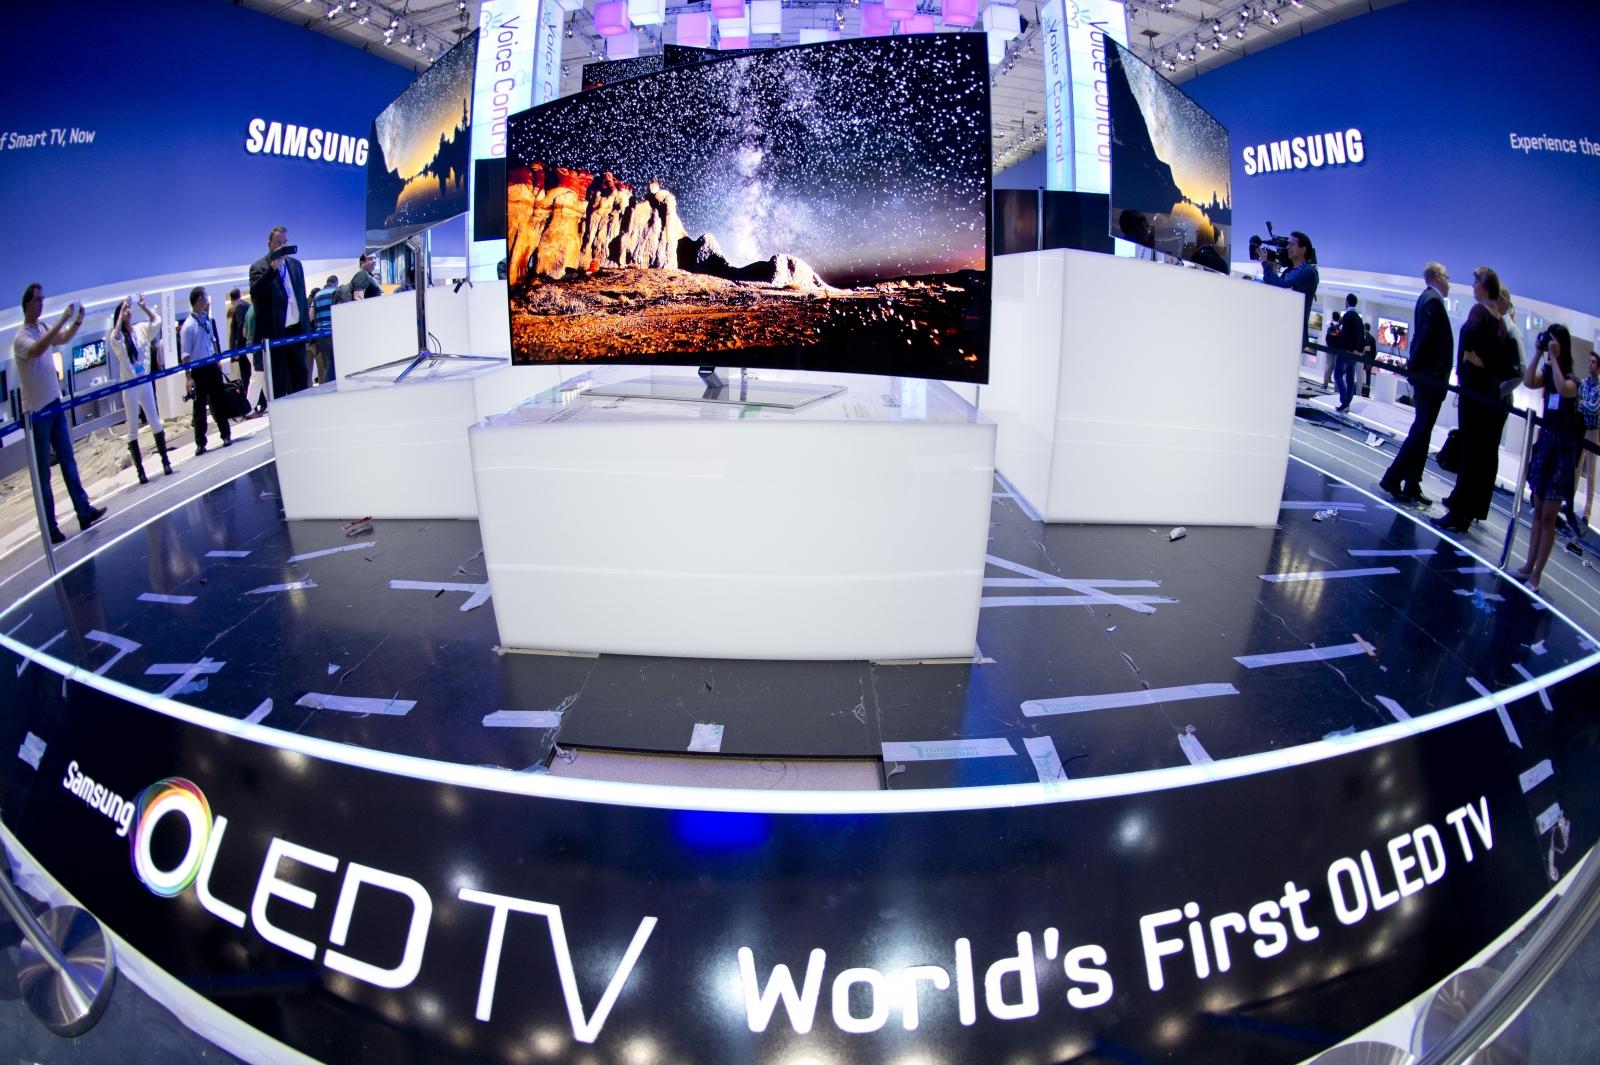 Samsung spins off OLED business